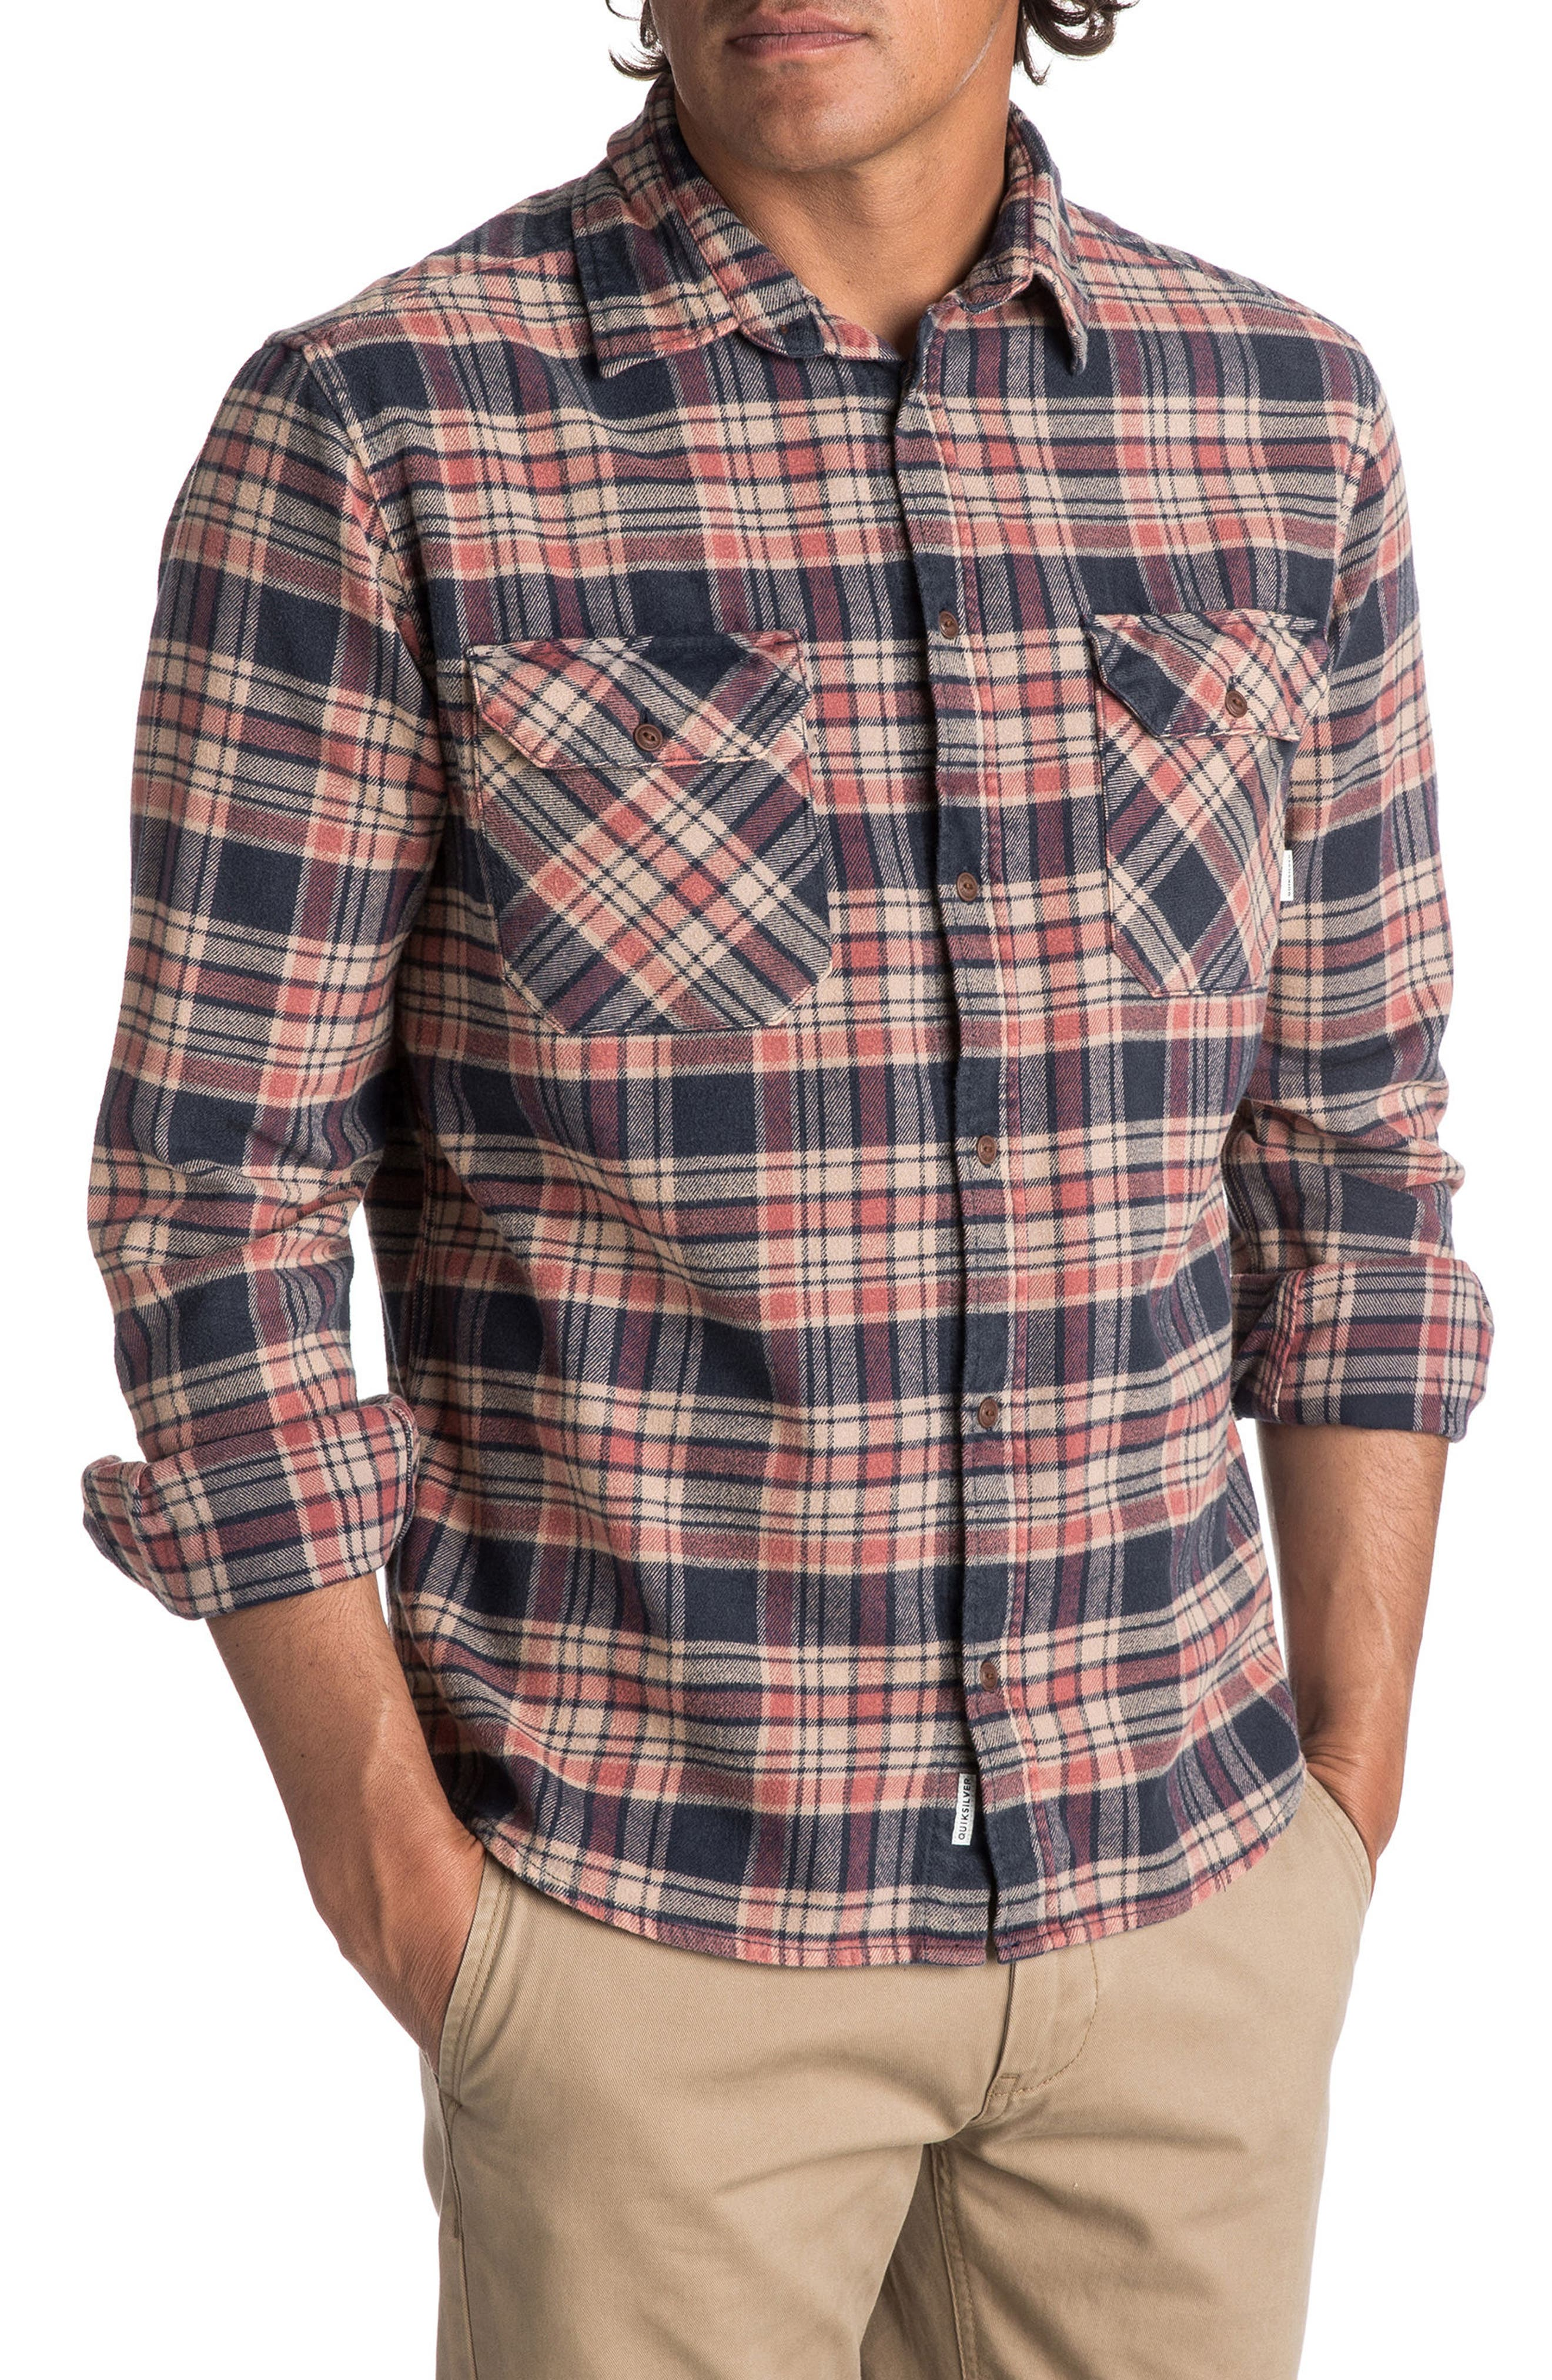 Tangloop Plaid Flannel Shirt,                             Main thumbnail 1, color,